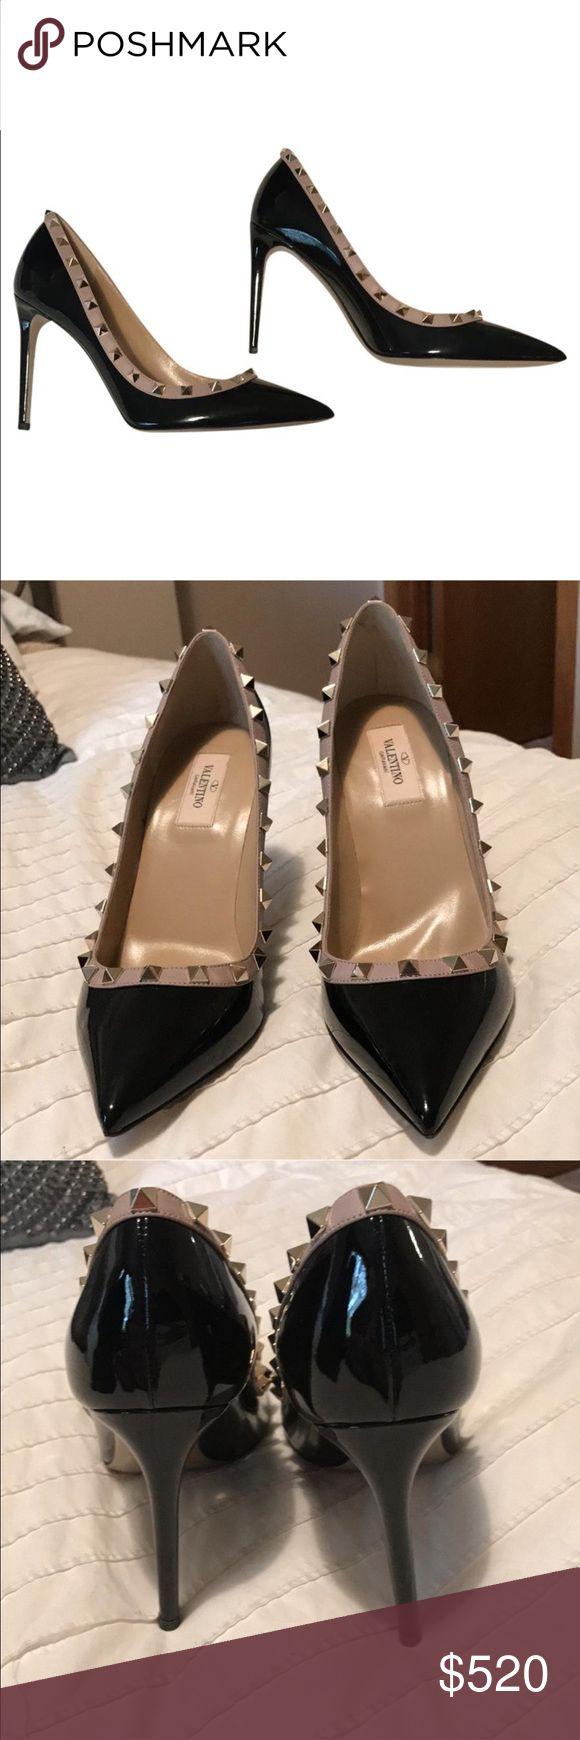 Valentino Rockstud Heels Never worn. 2 sharpie marks on soles. Valentino Shoes Heels